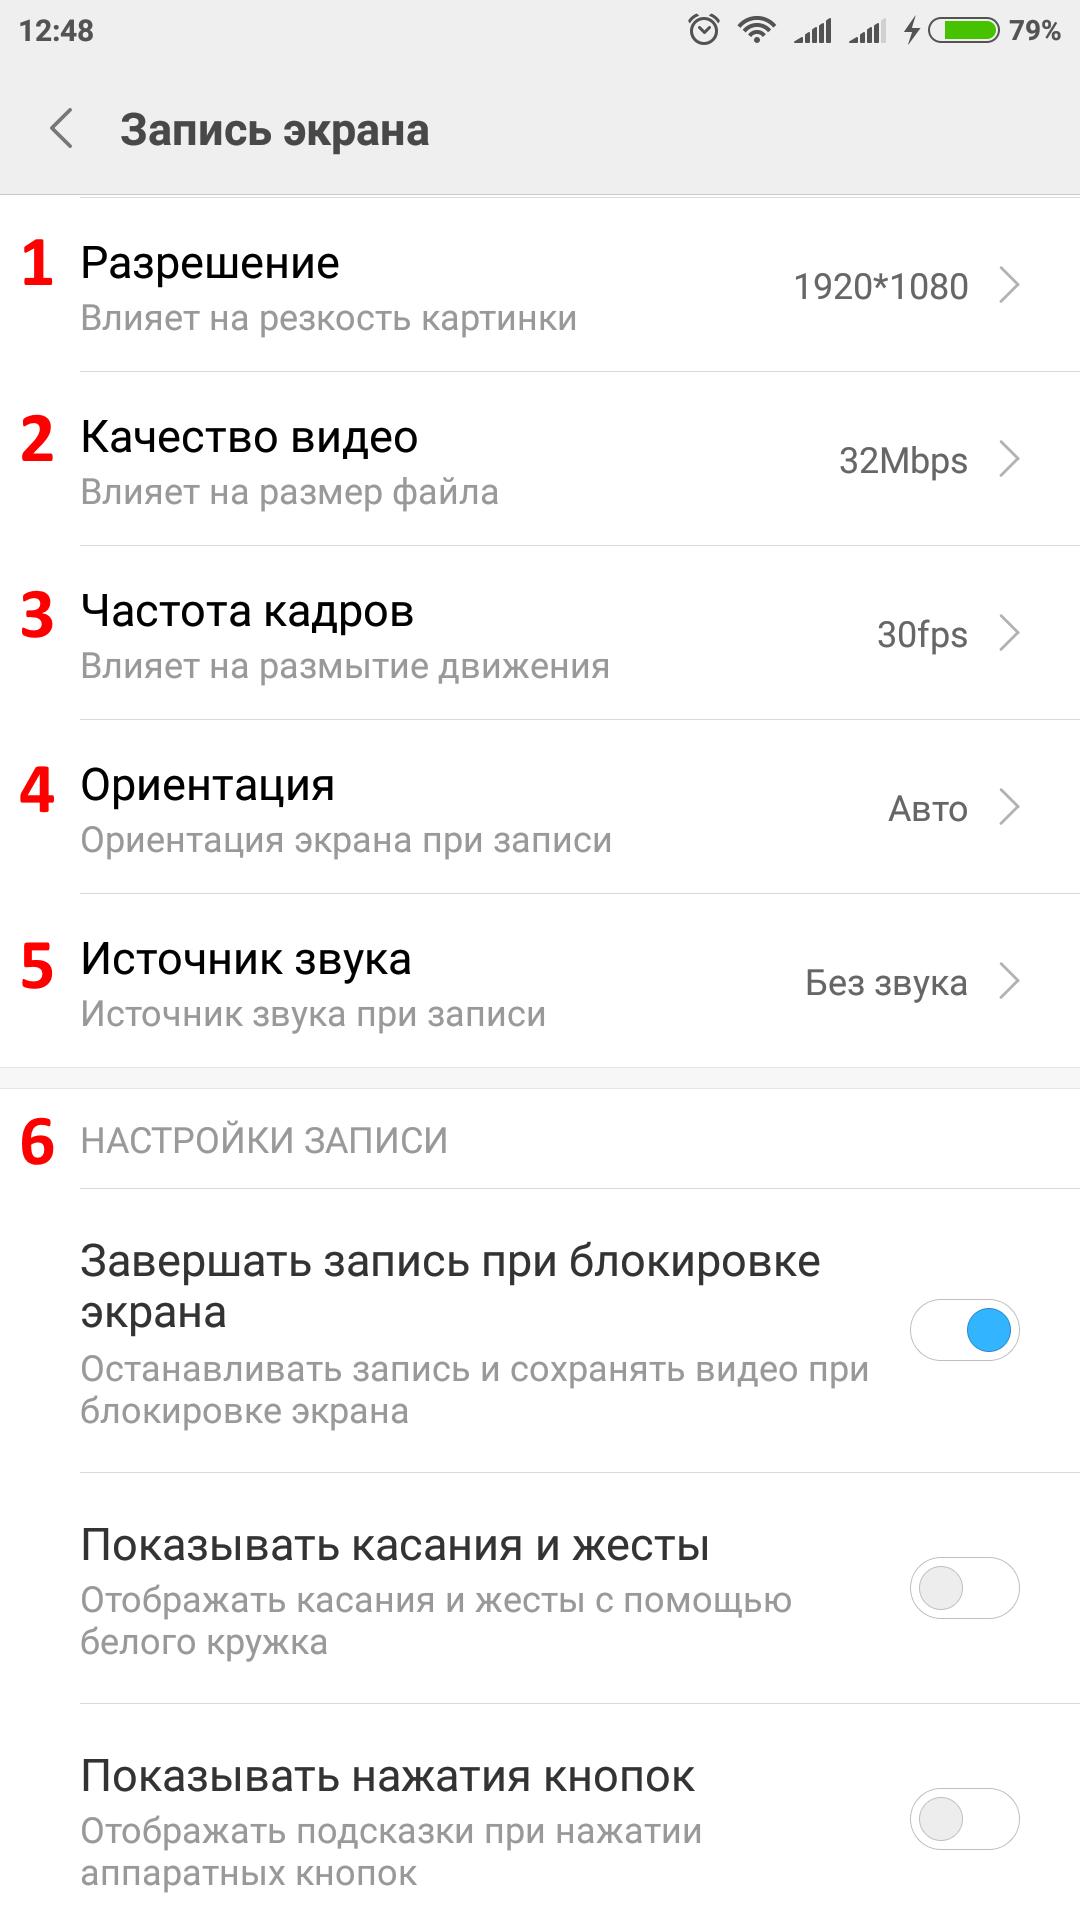 Настройки Записи экрана в Xiaomi Redmi 4 Pro